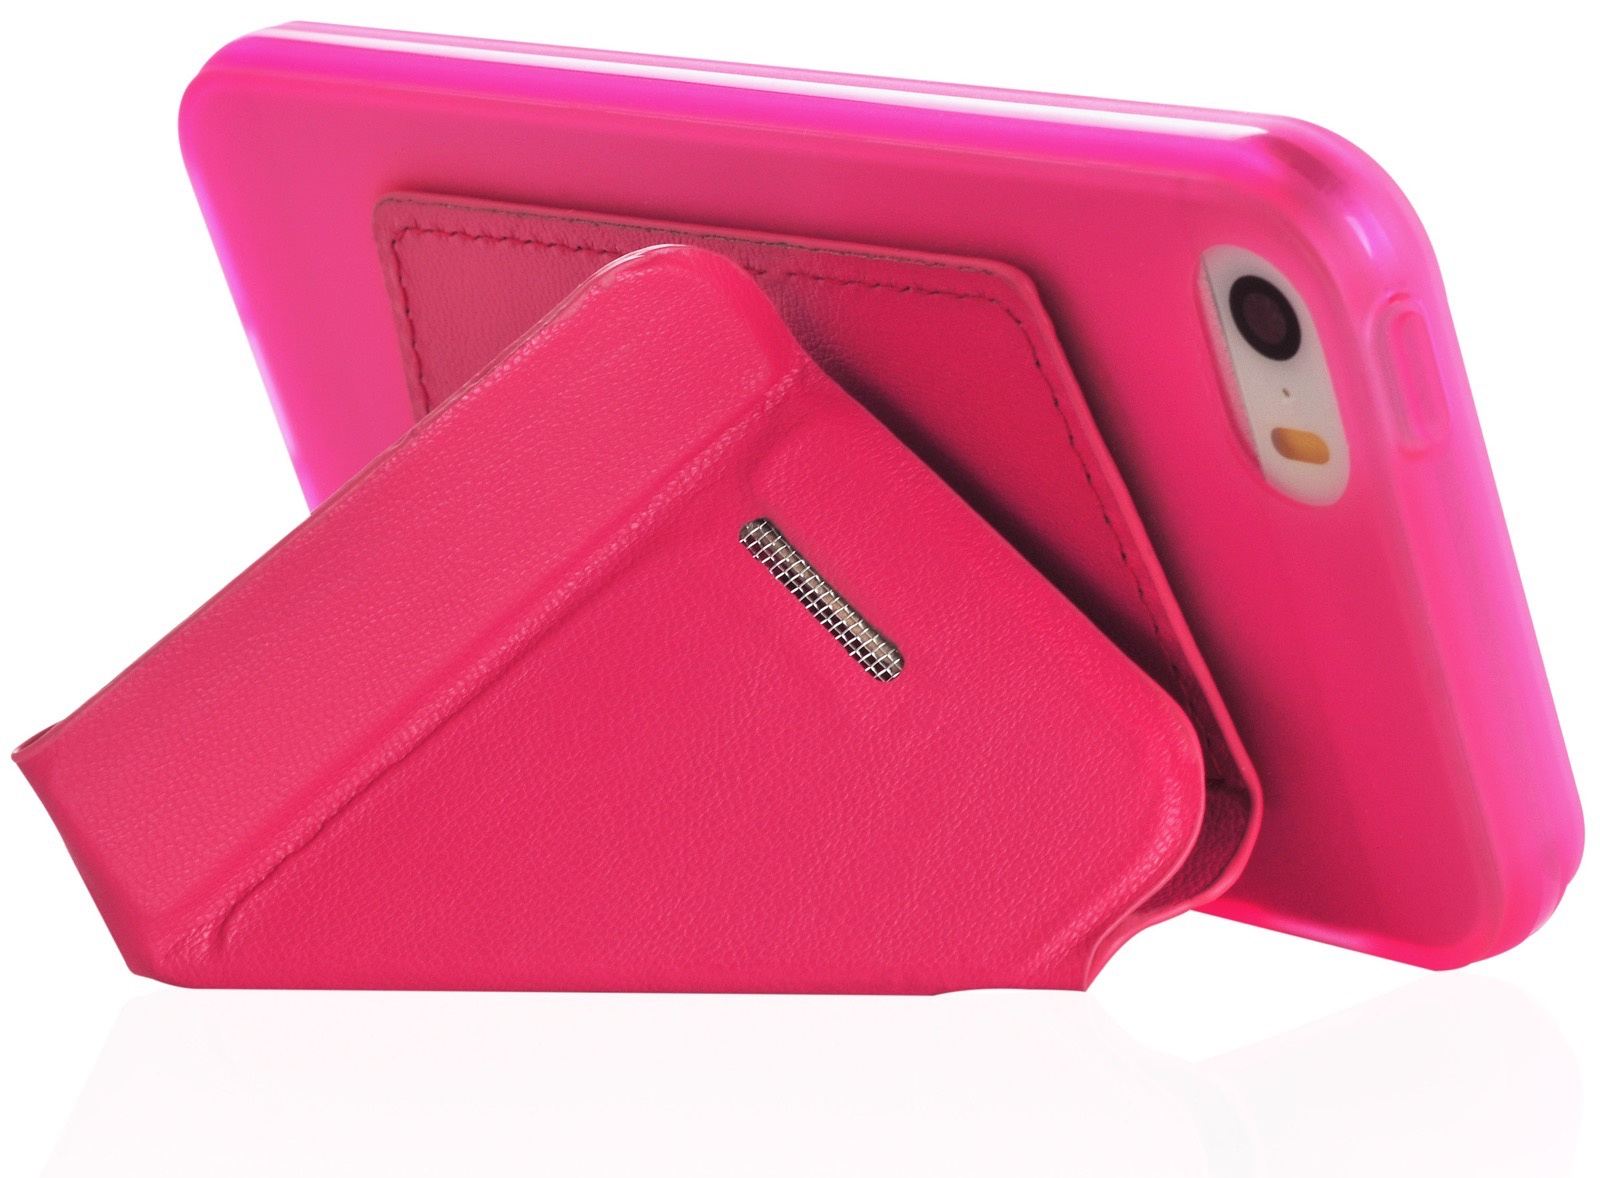 Чехол для Apple iPhone 5/5s/SE книжка Flip силикон + кожа оригами rose для Apple iPhone 5/5S/SE цена и фото